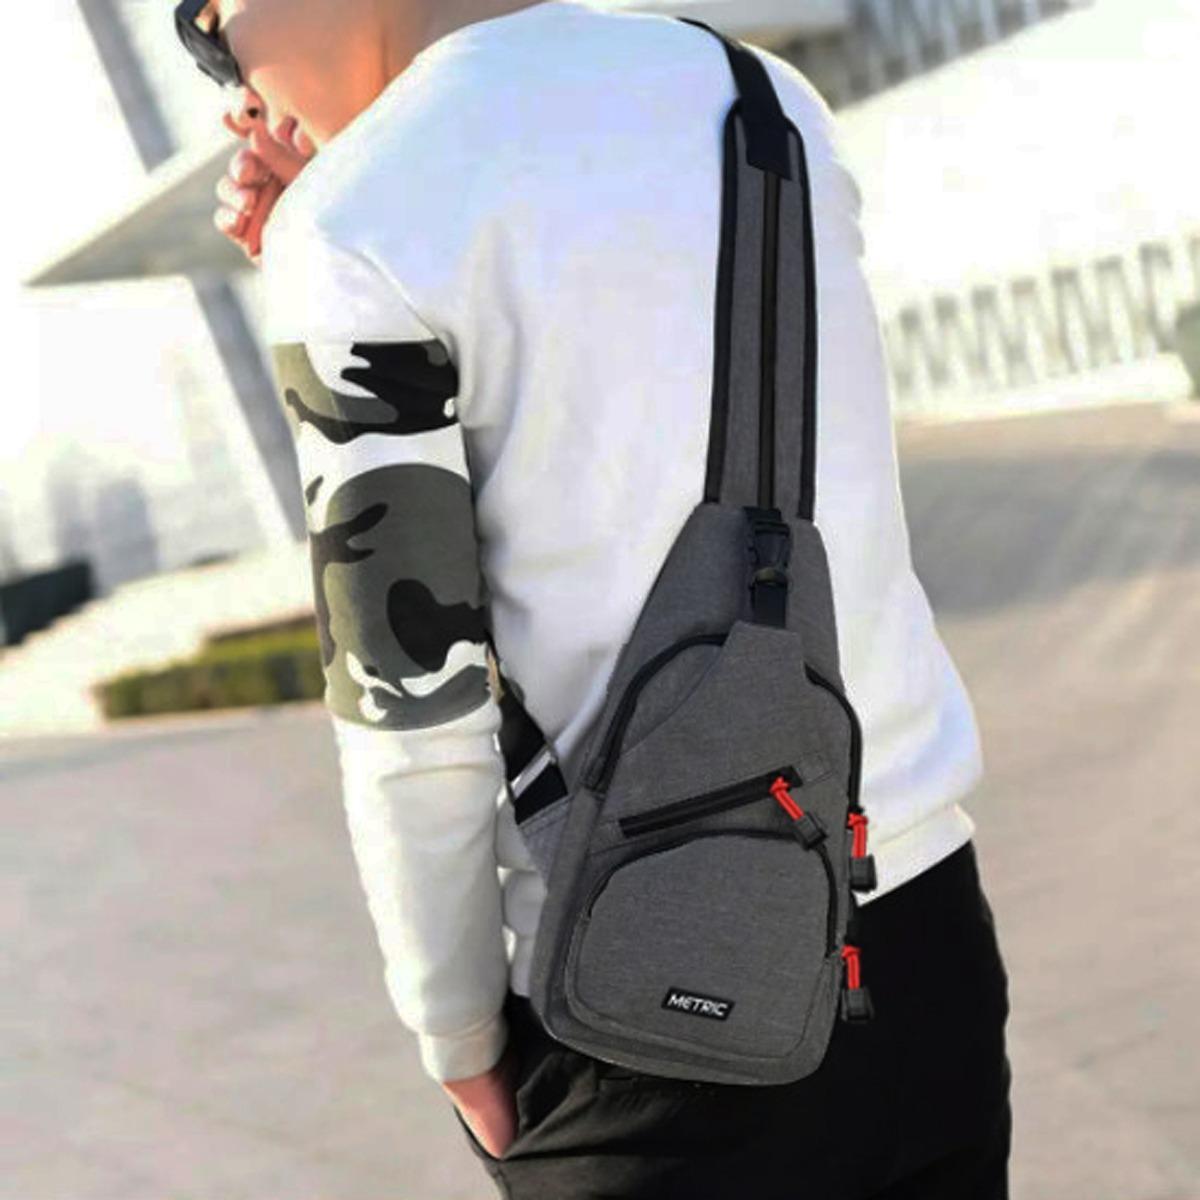 Metric Sling Bag Korea Tas Ransel Tali Satu Tas Waistbag Tas Selempang Tas Gadget Tas Smartphone Kode Artikel Mi004 Street Style Korean Design - Dark Grey